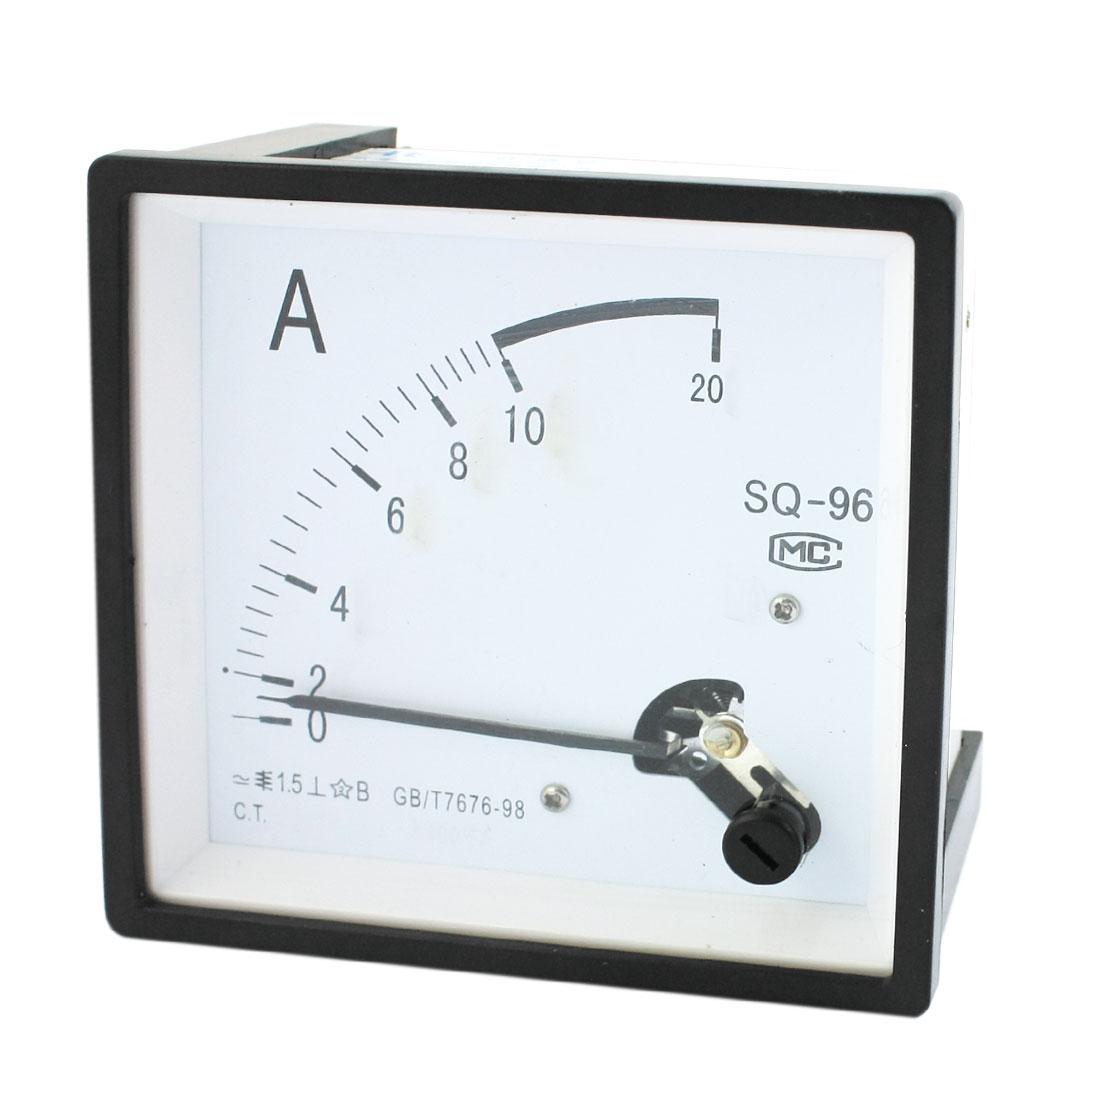 AC 0-10A Measuring Range Class 1.5 Current Testing Panel Mounting Rectangle Analog Meter Amperemeter